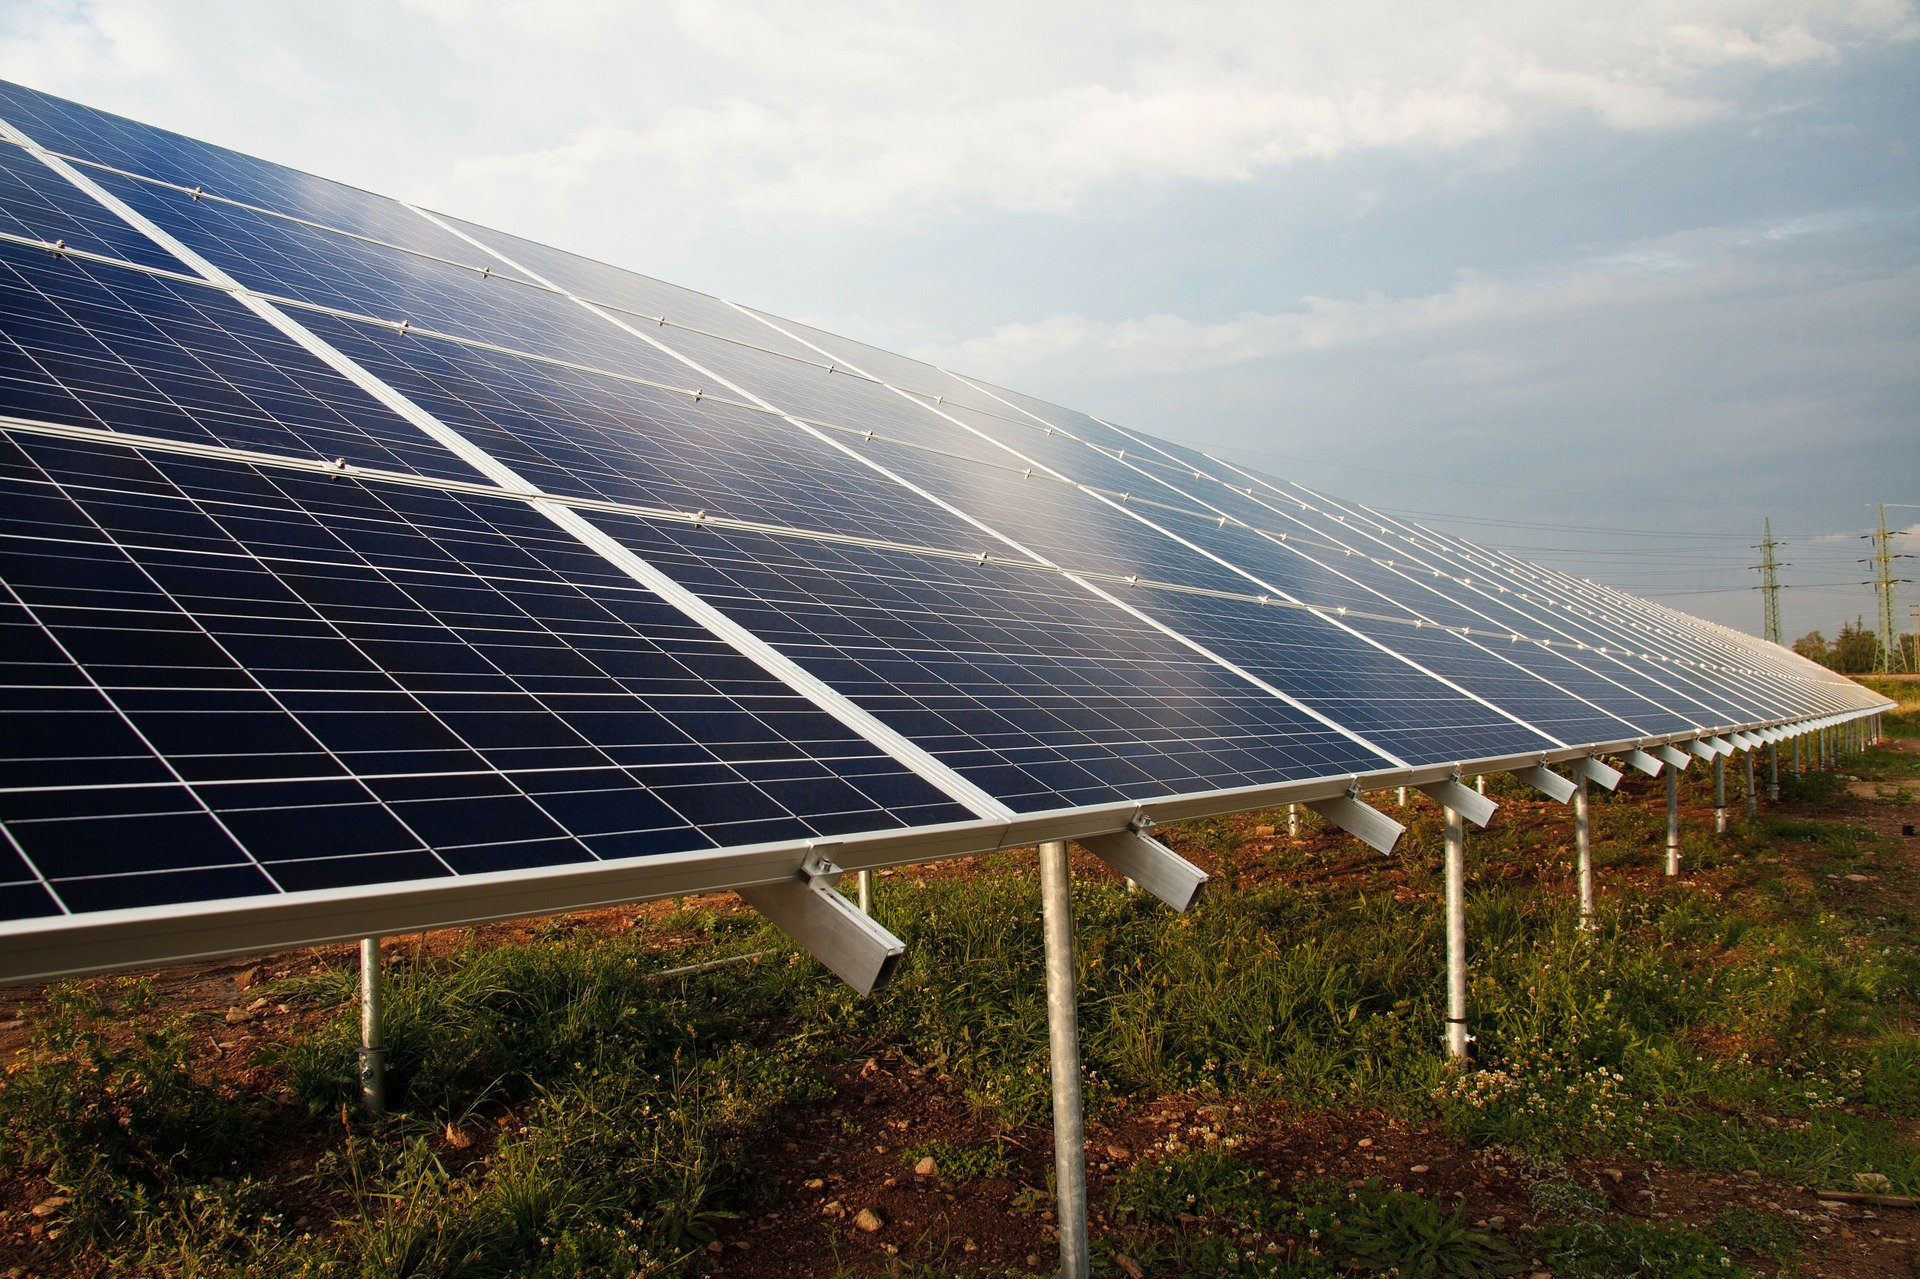 Solcellerpaneler